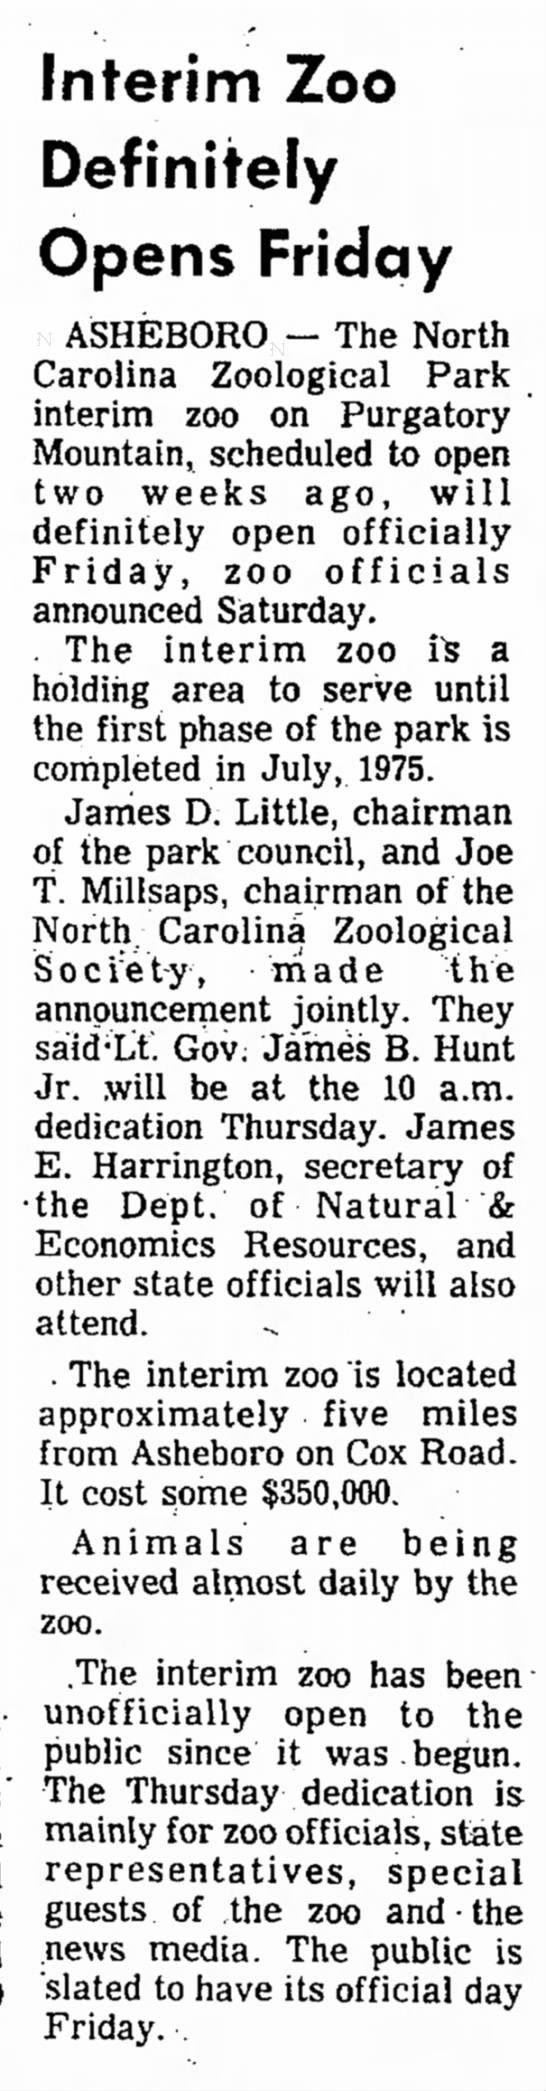 James D Little chairman - NC Zoo opening - The High Point Enterprise, 28 Jul 1974, pg 2 -